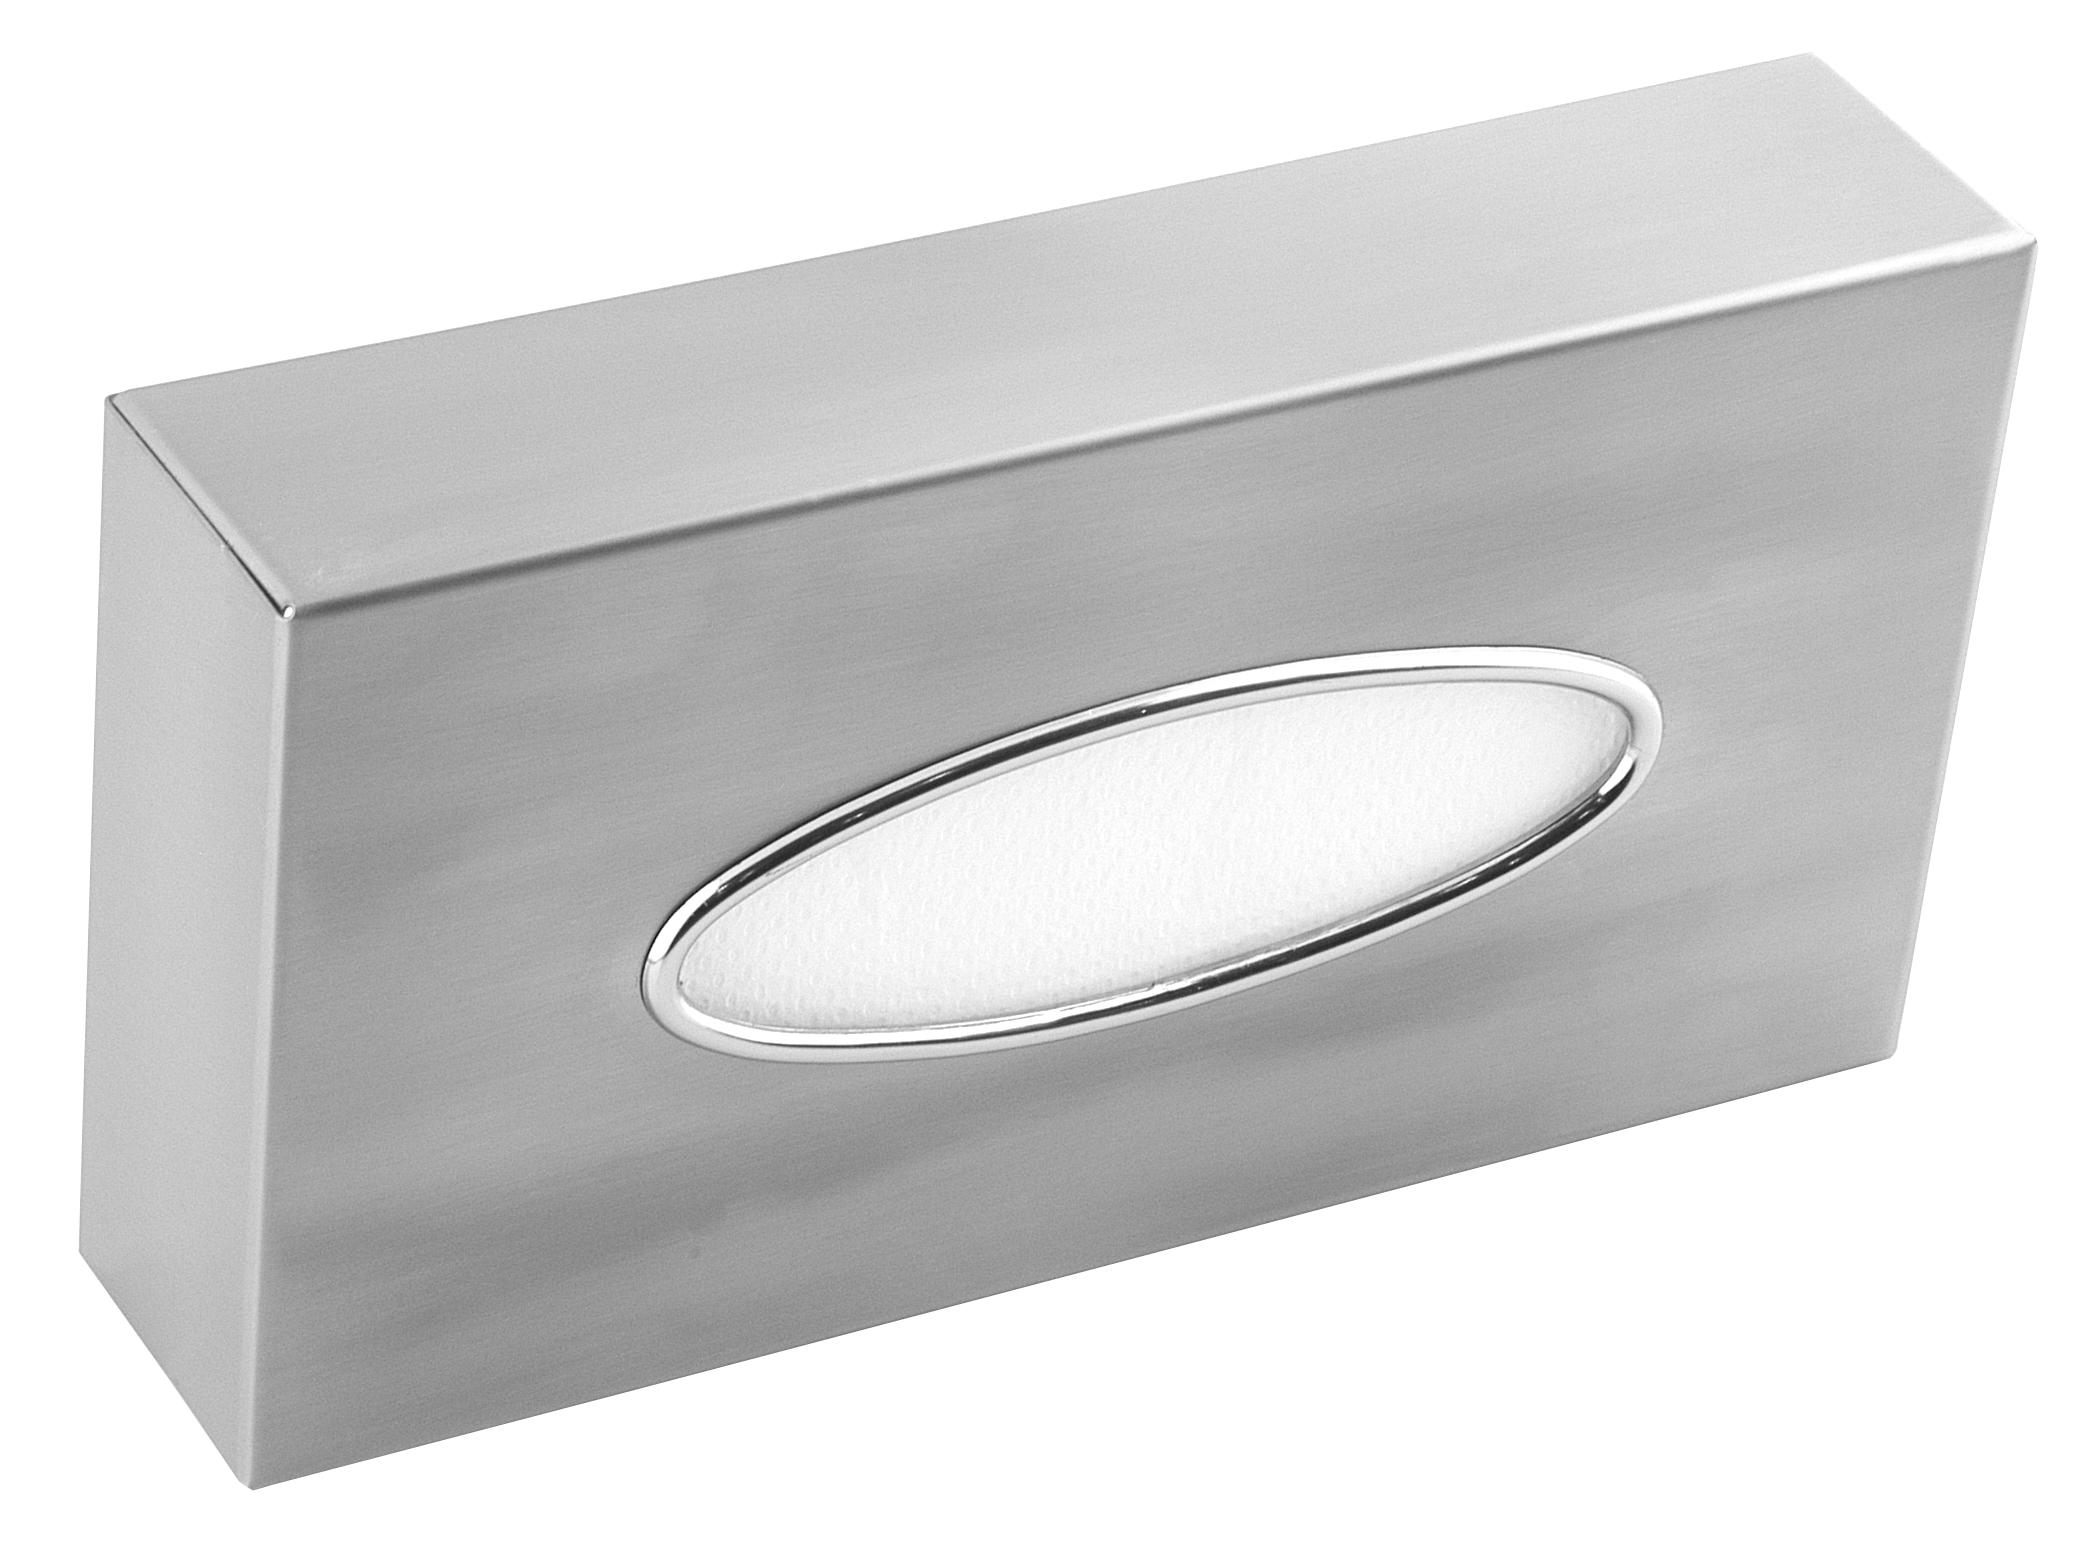 ALL CARE Dispenserline - Facial tisseu dispenser RVS Mat